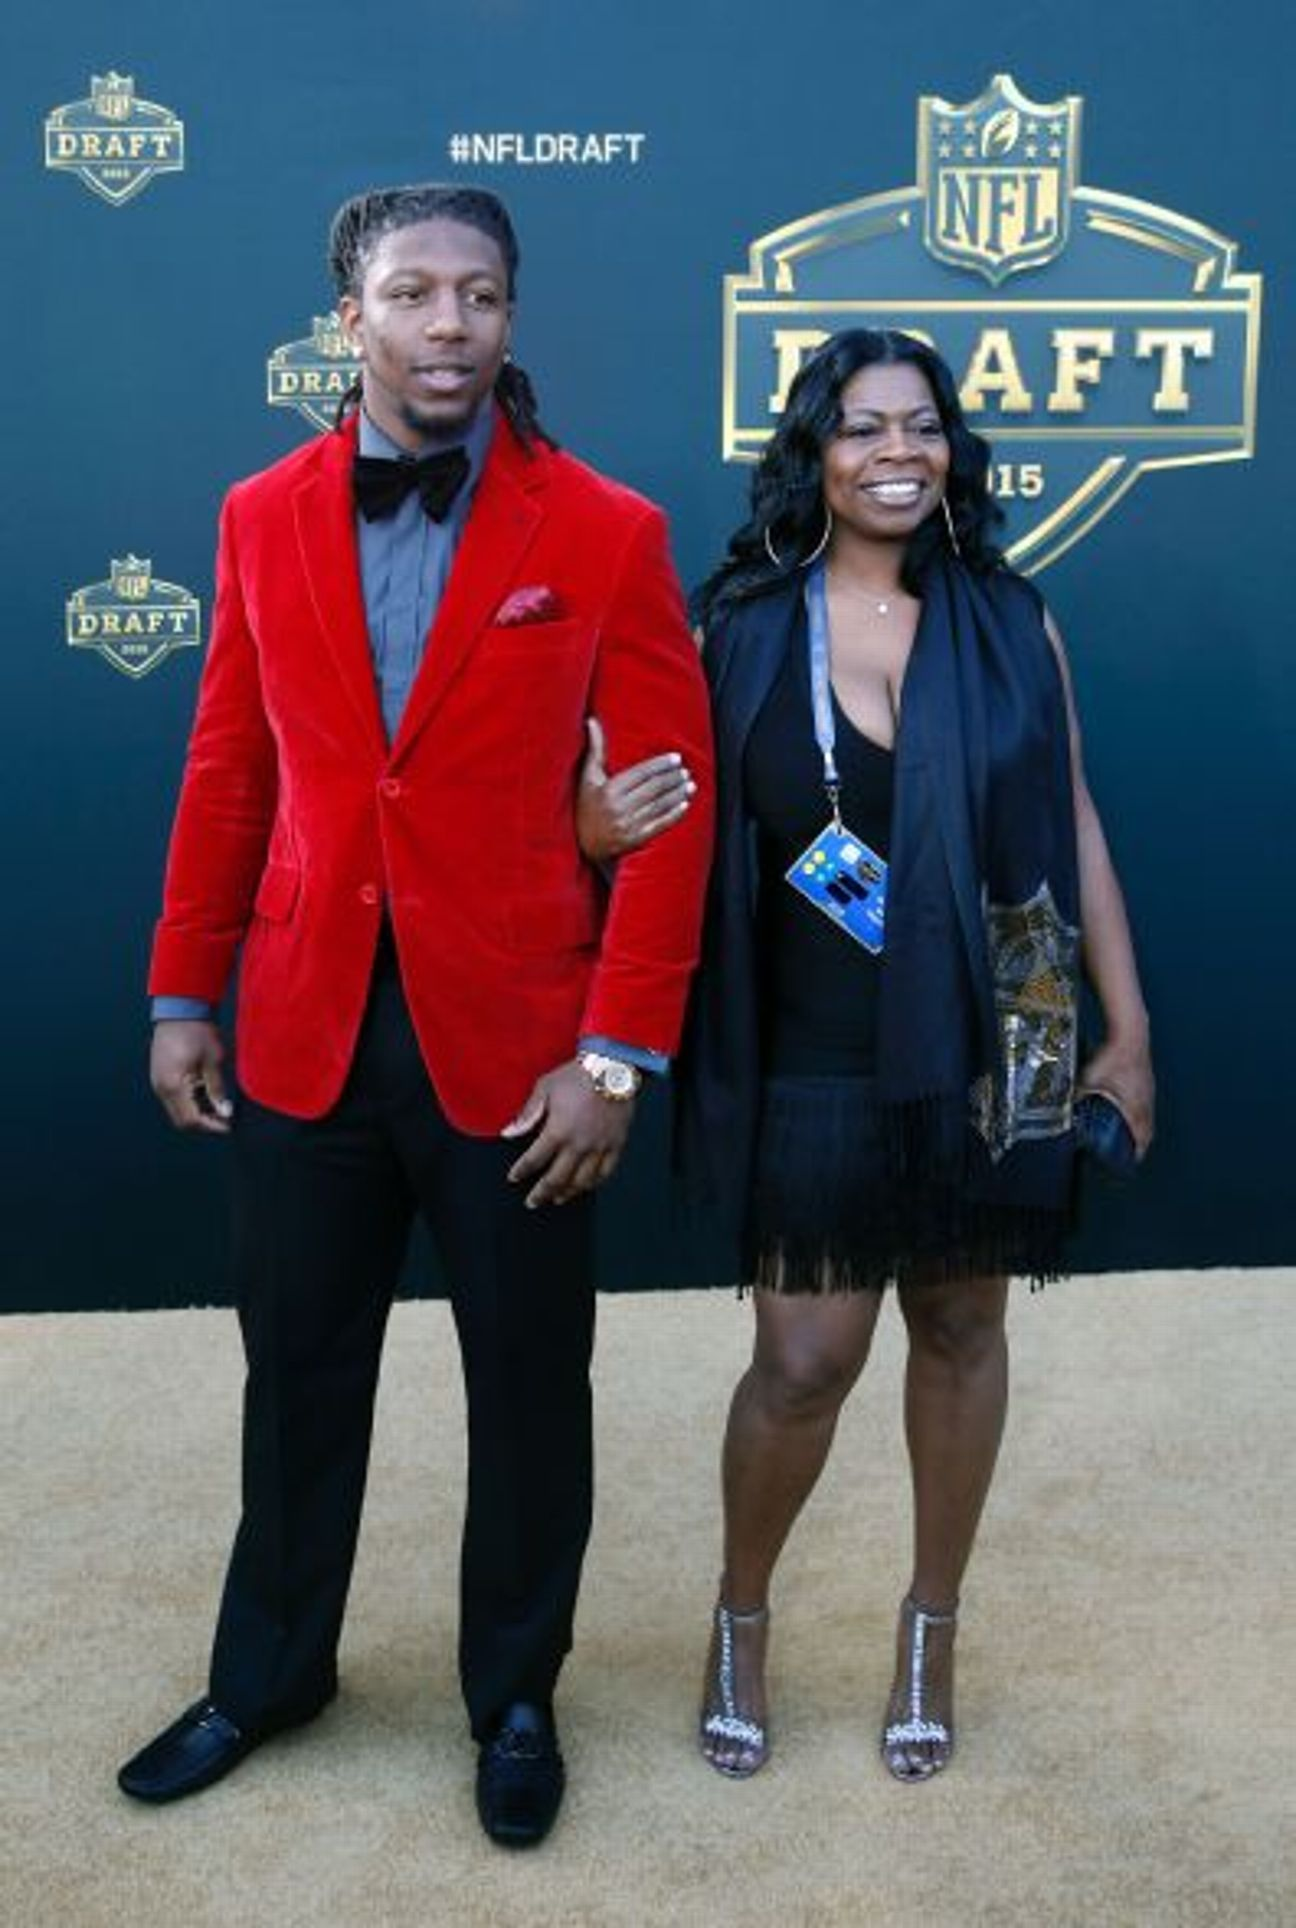 Nike jerseys for Cheap - NFL Draft Football - Football - Atlanta Falcons news - NewsLocker